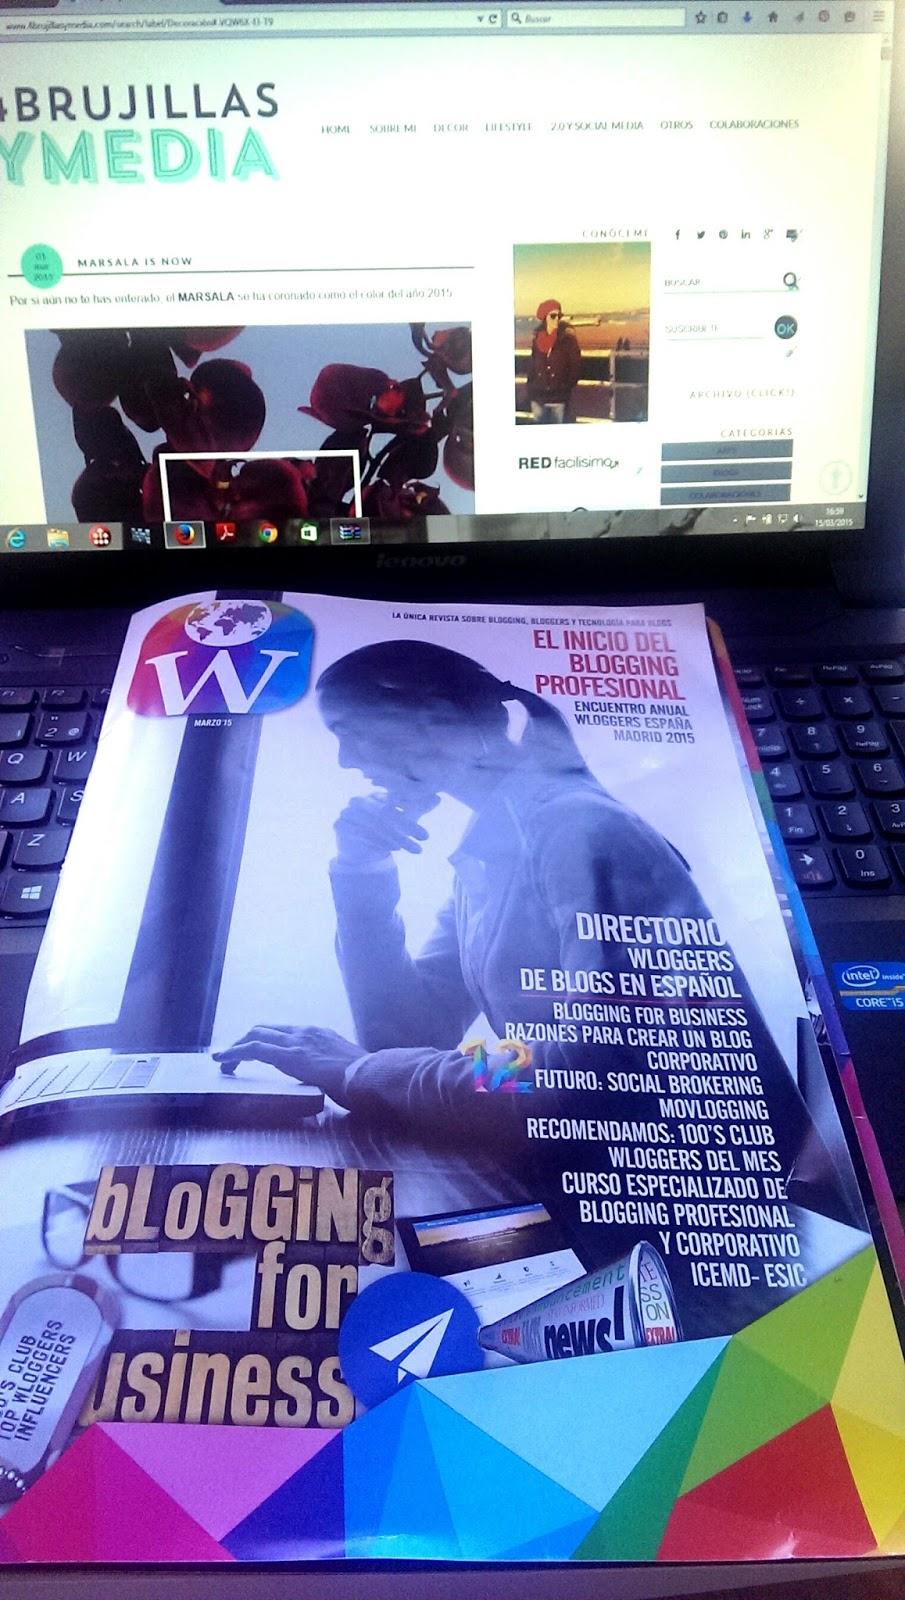 Wloggers 2015, Madrid, Revista